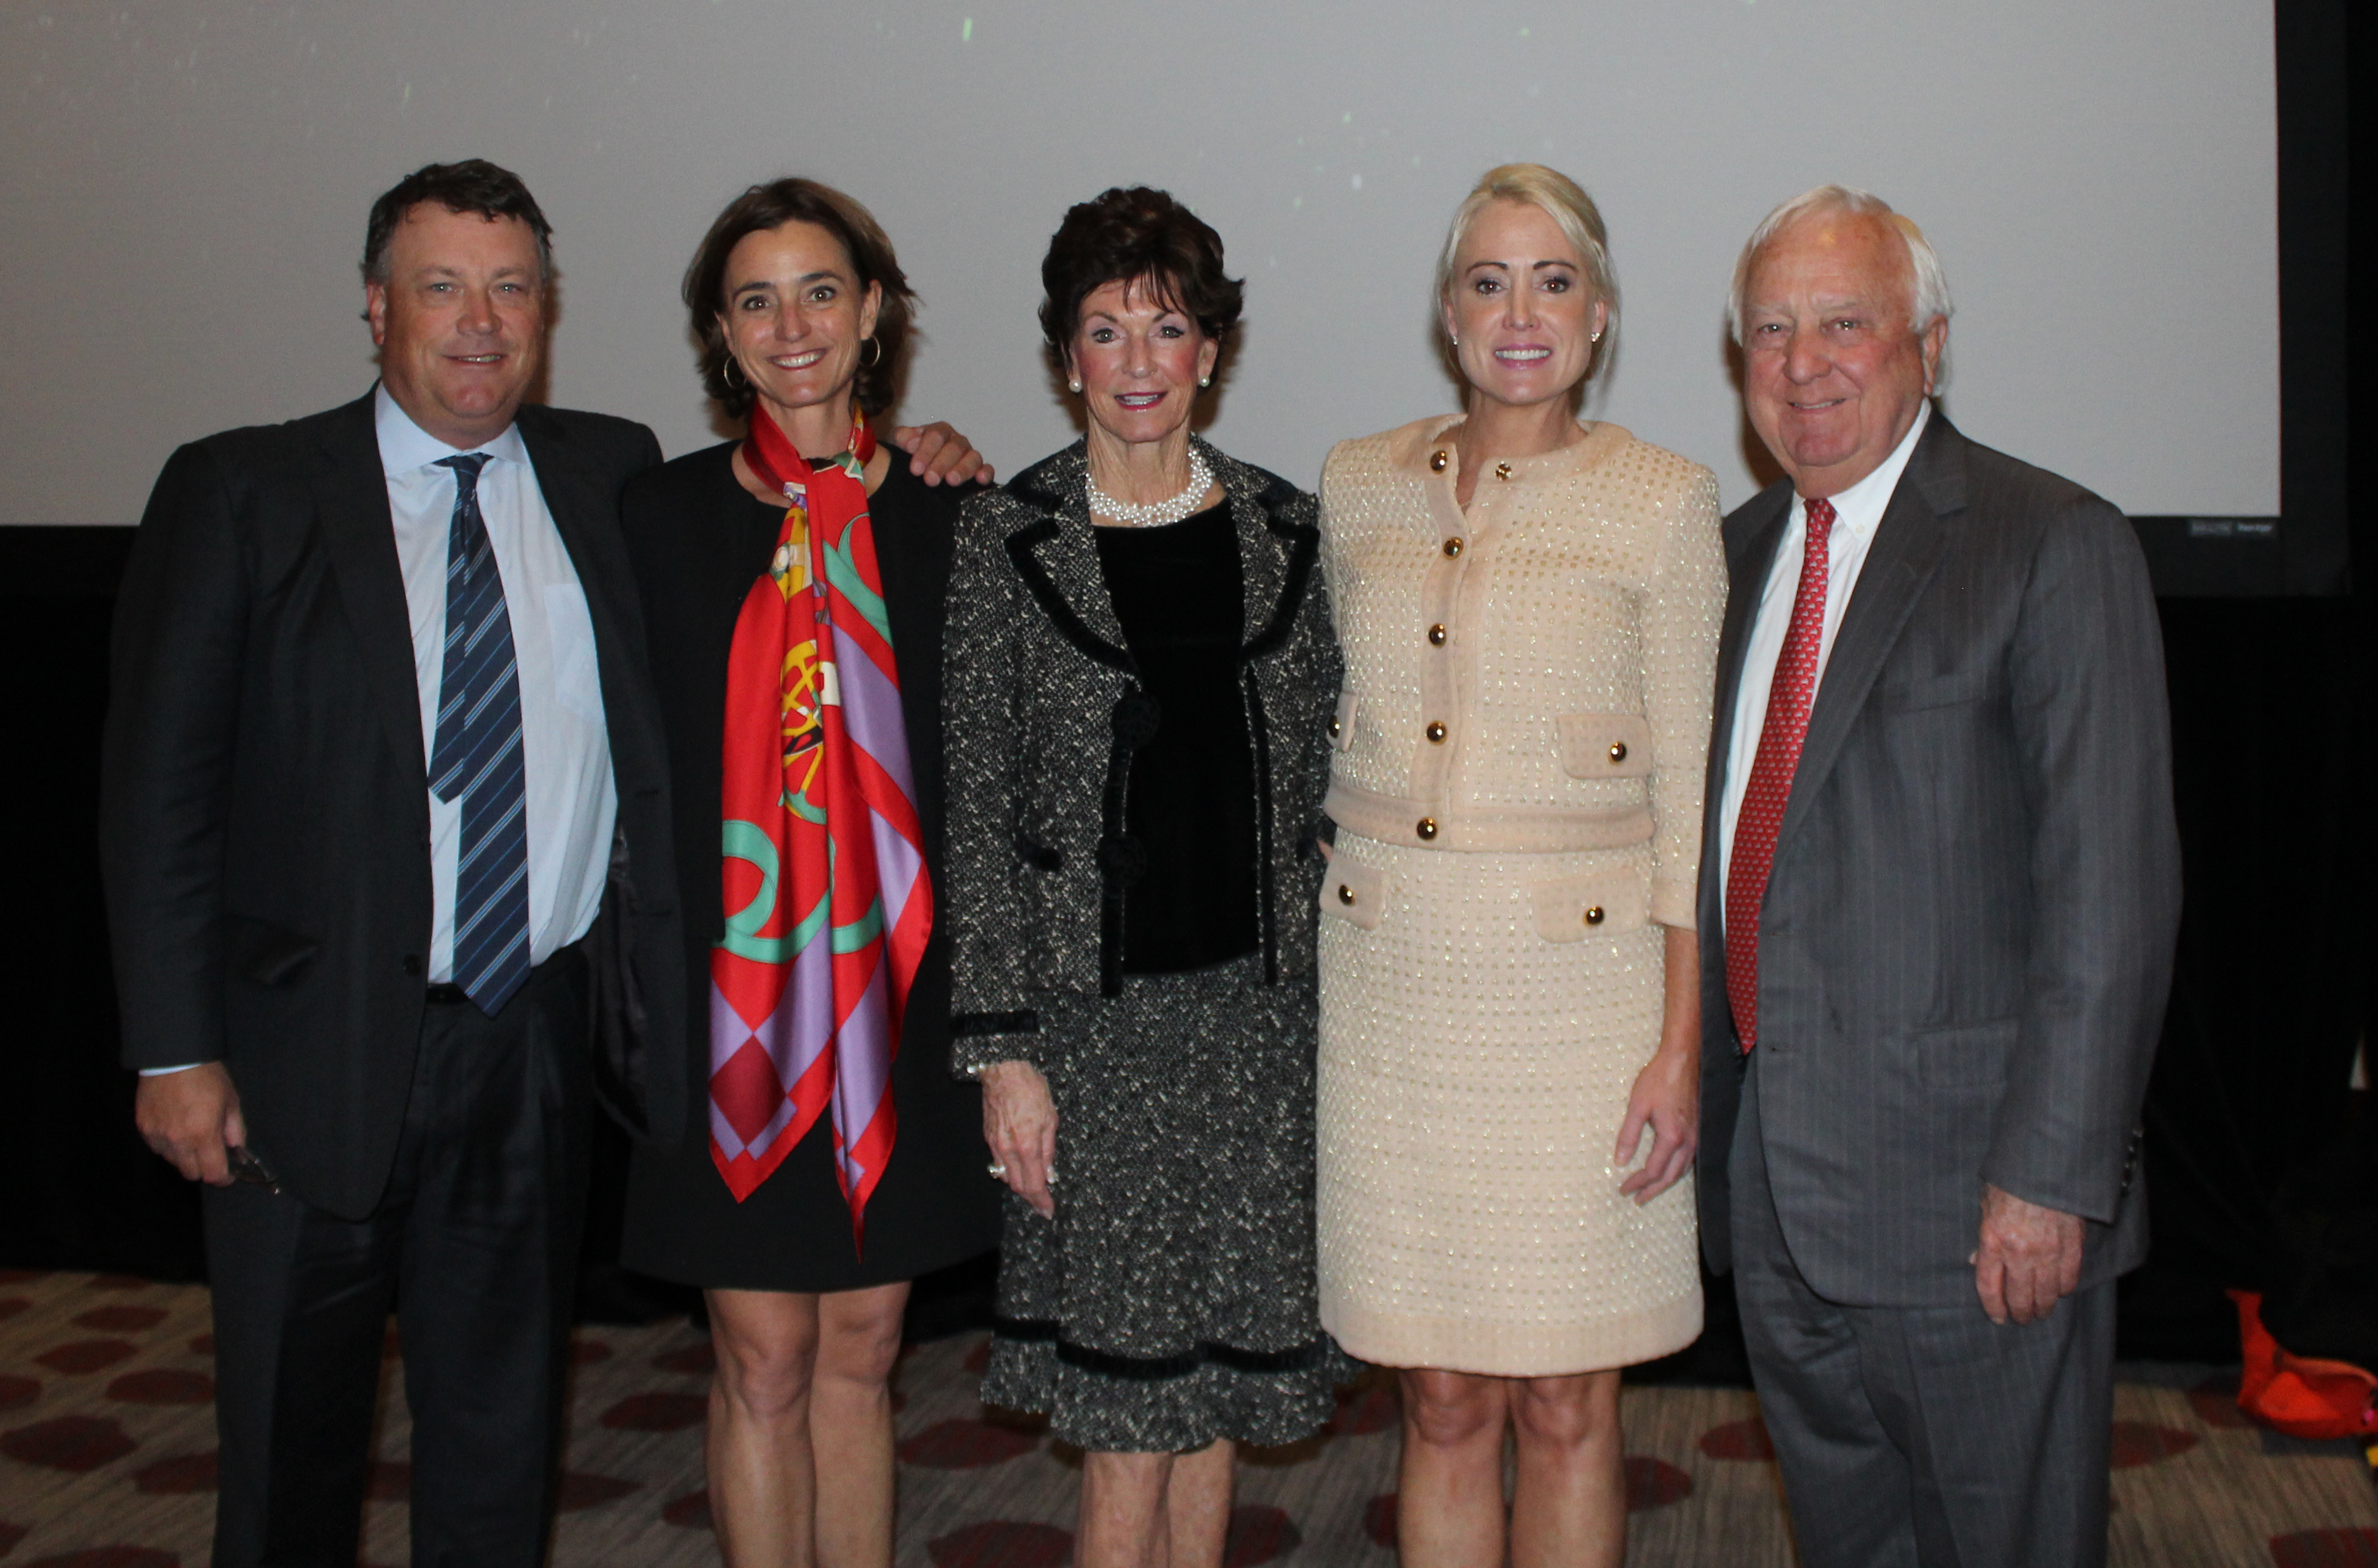 Sibcy and Sheakley Family